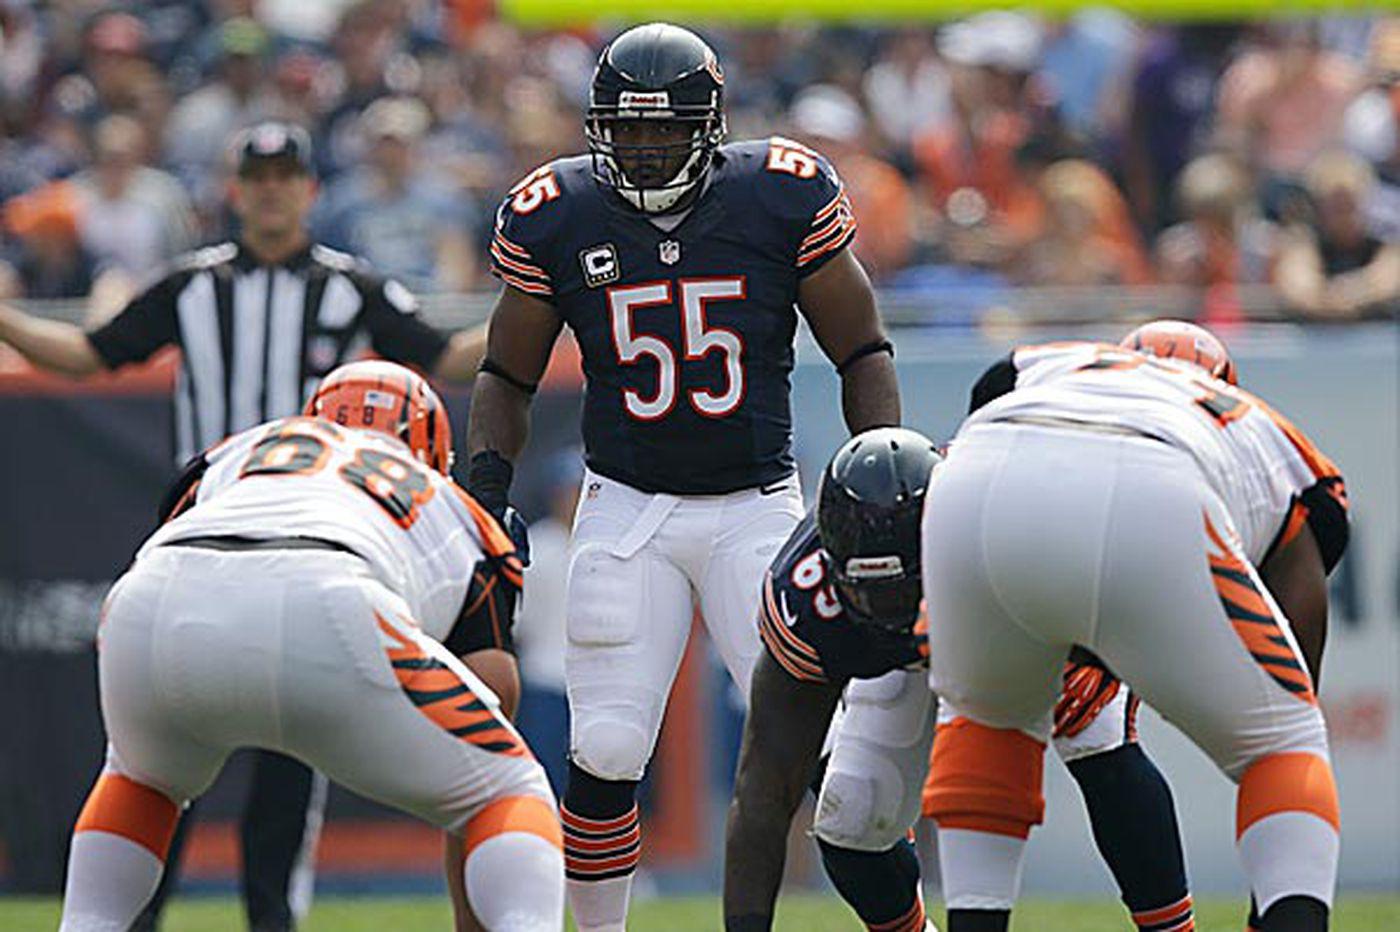 Linebacker Briggs could return for Bears